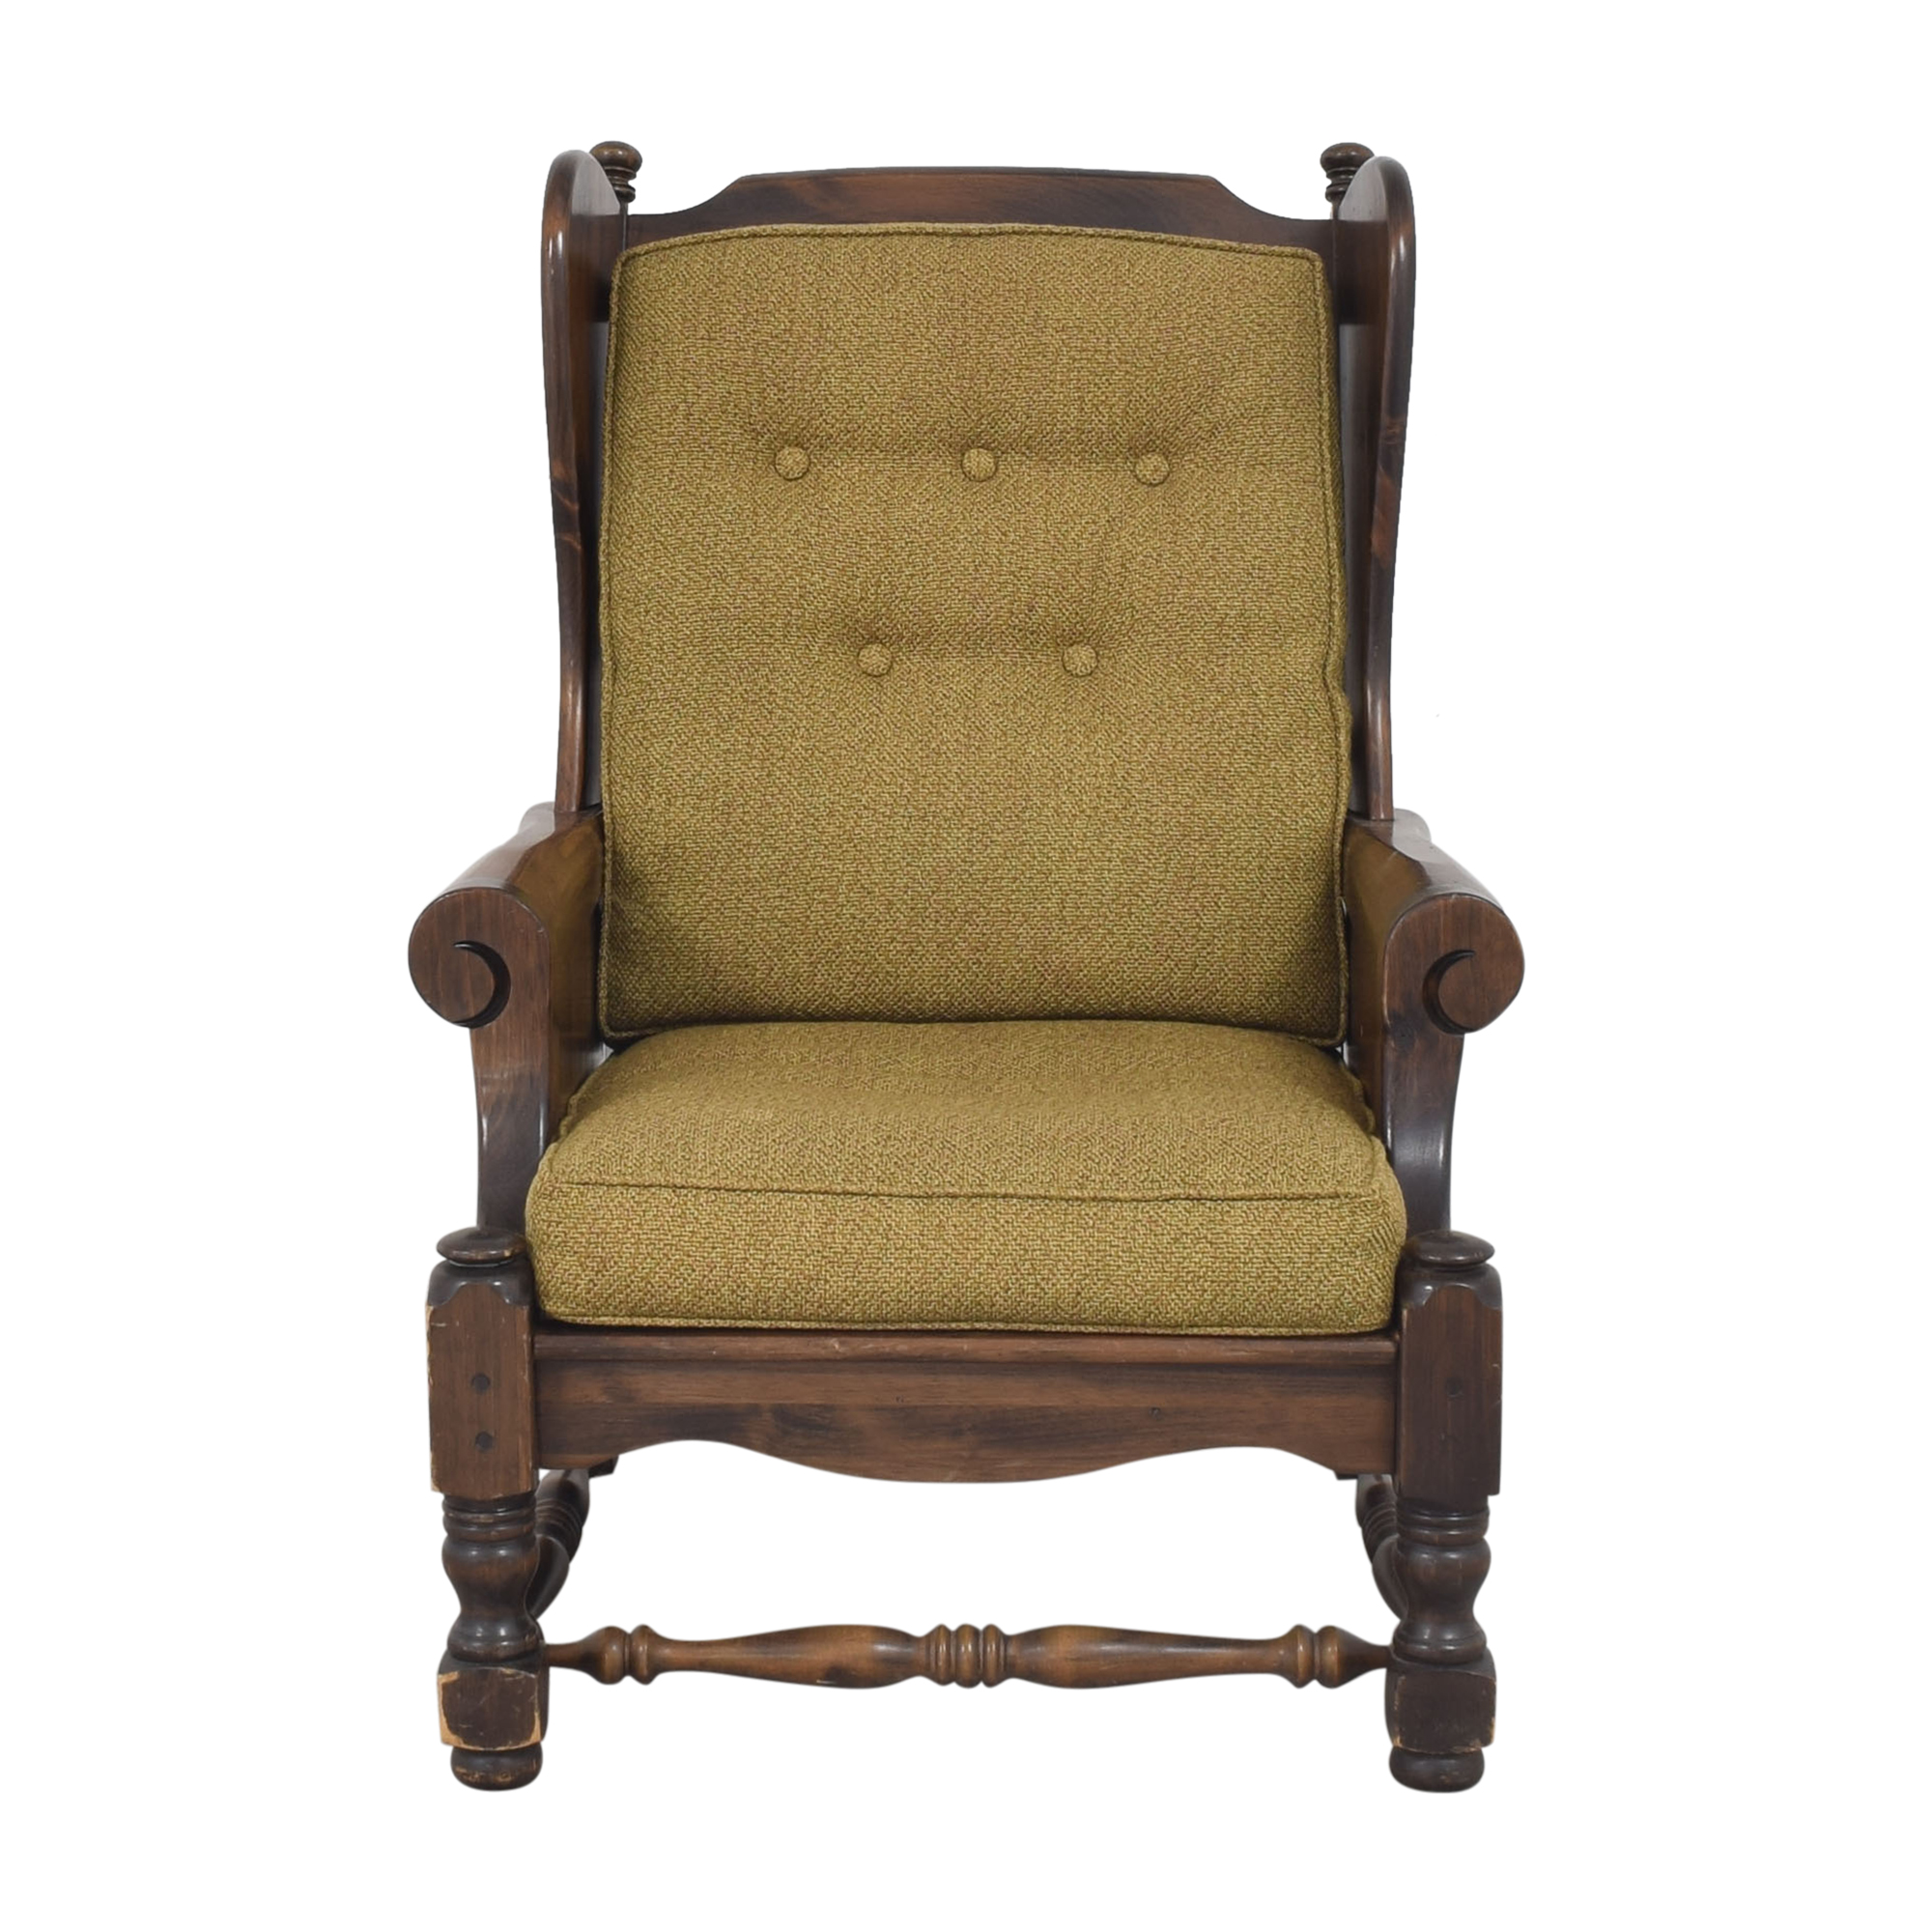 Bennington Pine Bennington Pine Button Tufted Club Chair used